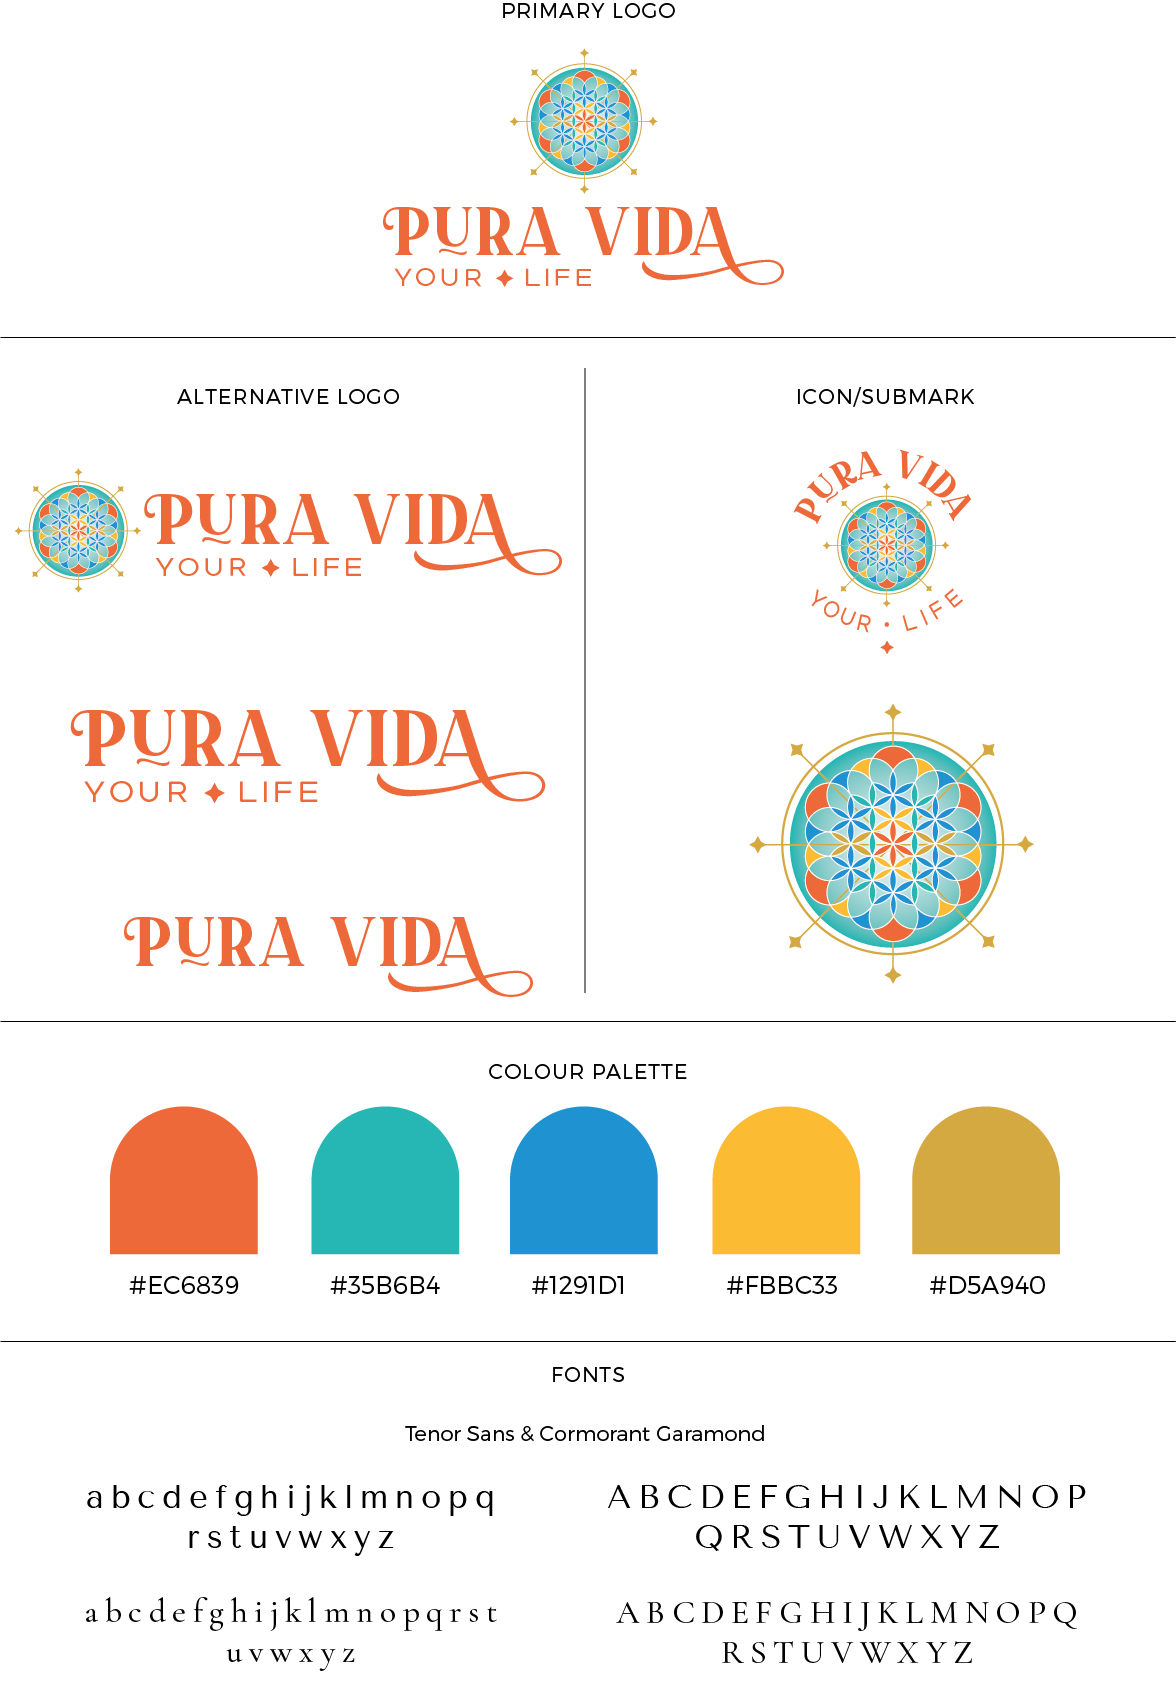 Pura Vida Your Life Brand Board